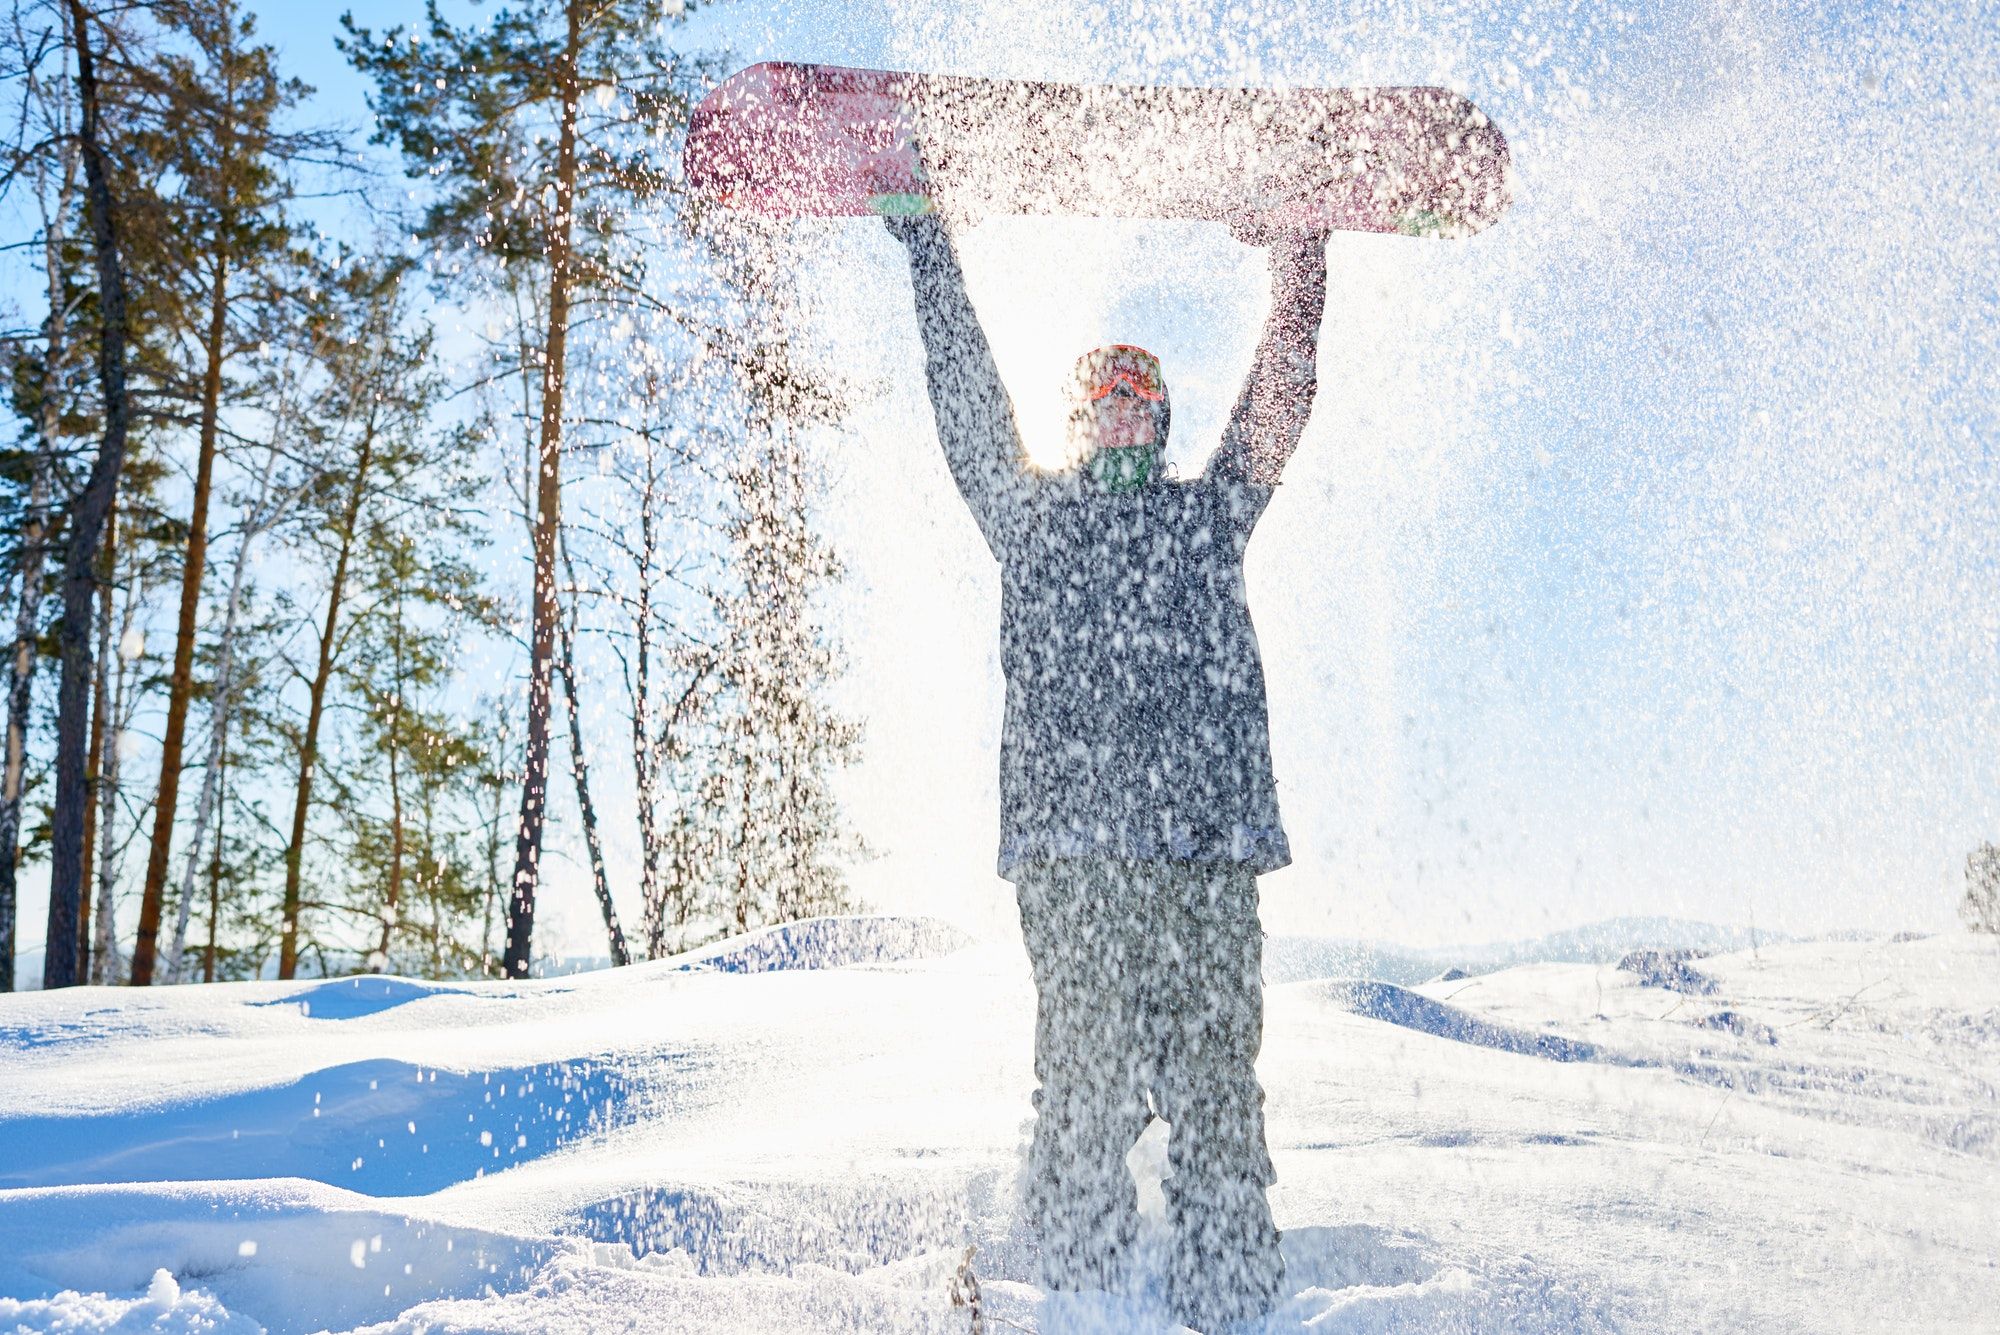 Snowboarder in Snow